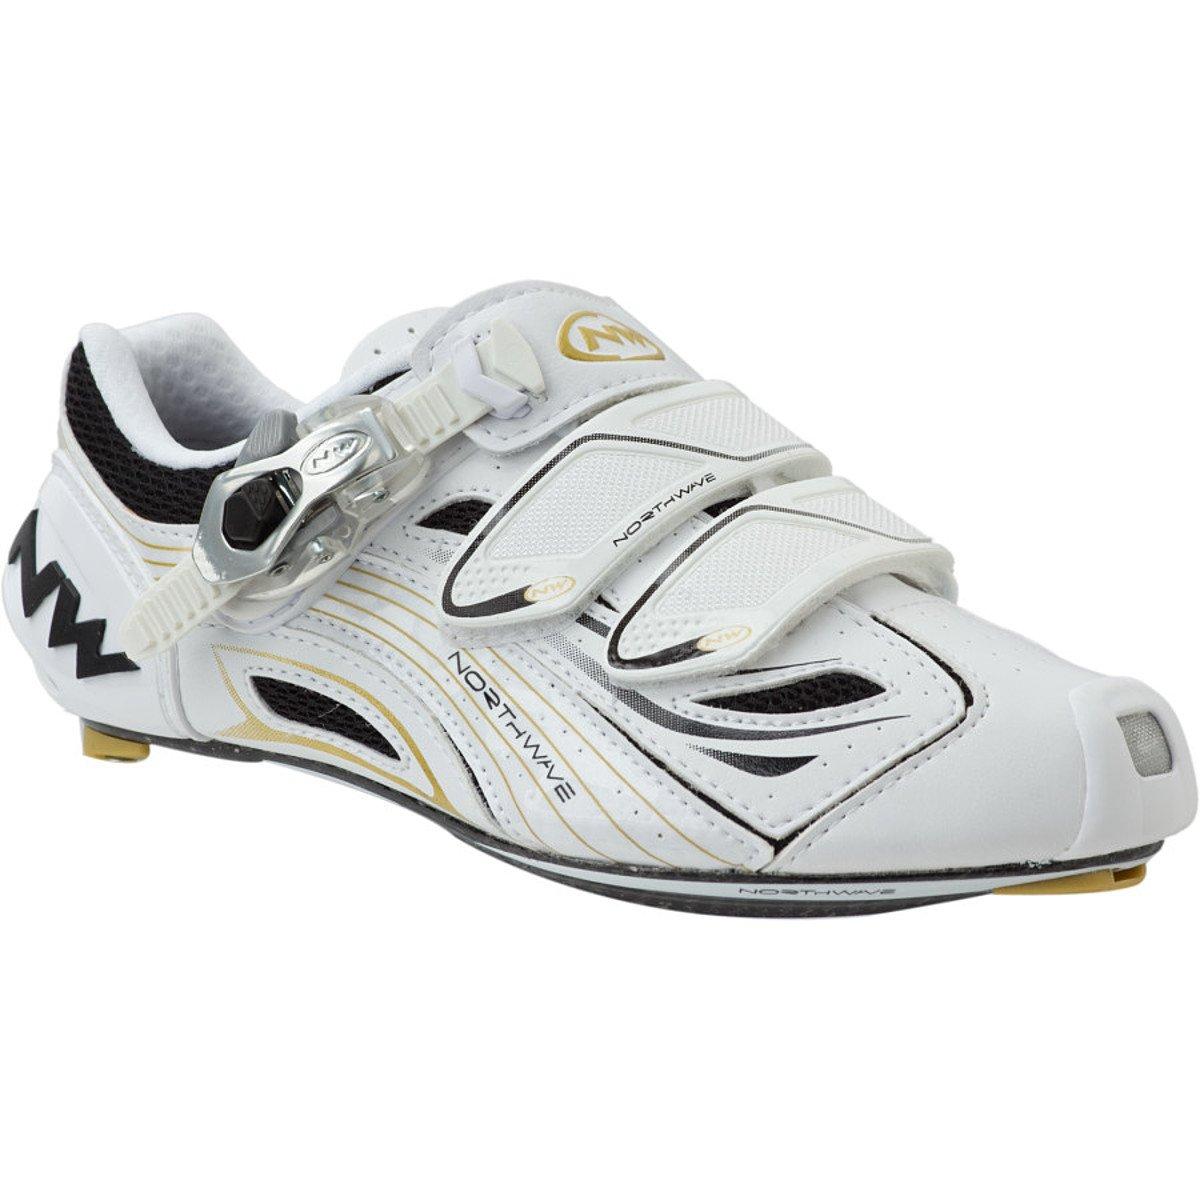 [Northwave] ノースウェーブTyphoon Women 's Road Cycling Shoesホワイト/ブラック/ゴールド 36 ホワイト/ブラック/ゴールド B006QXNI36